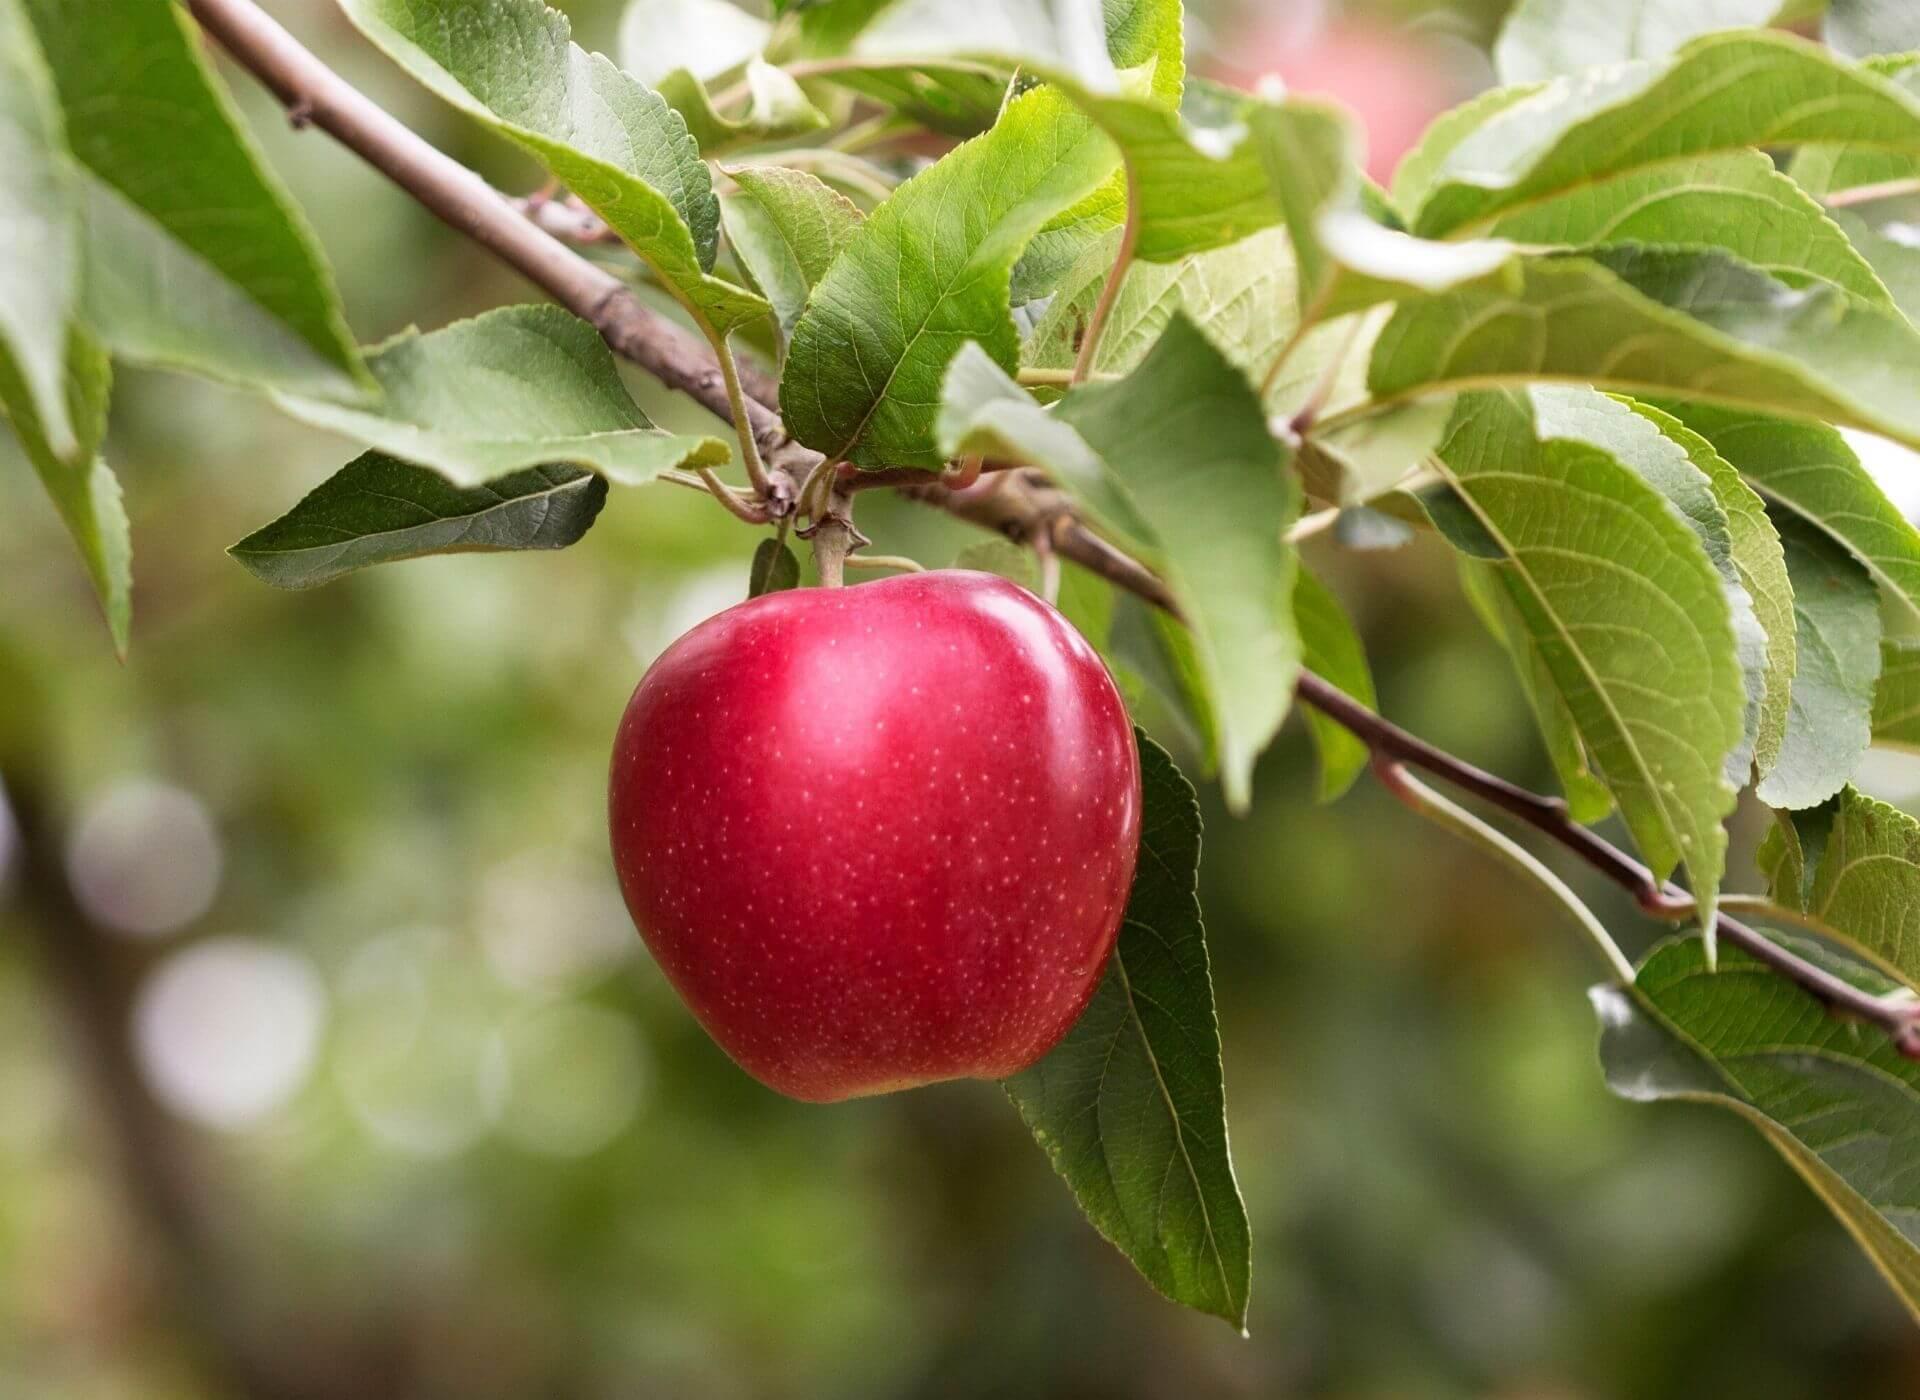 Ripe apple hanging from lush tree branch